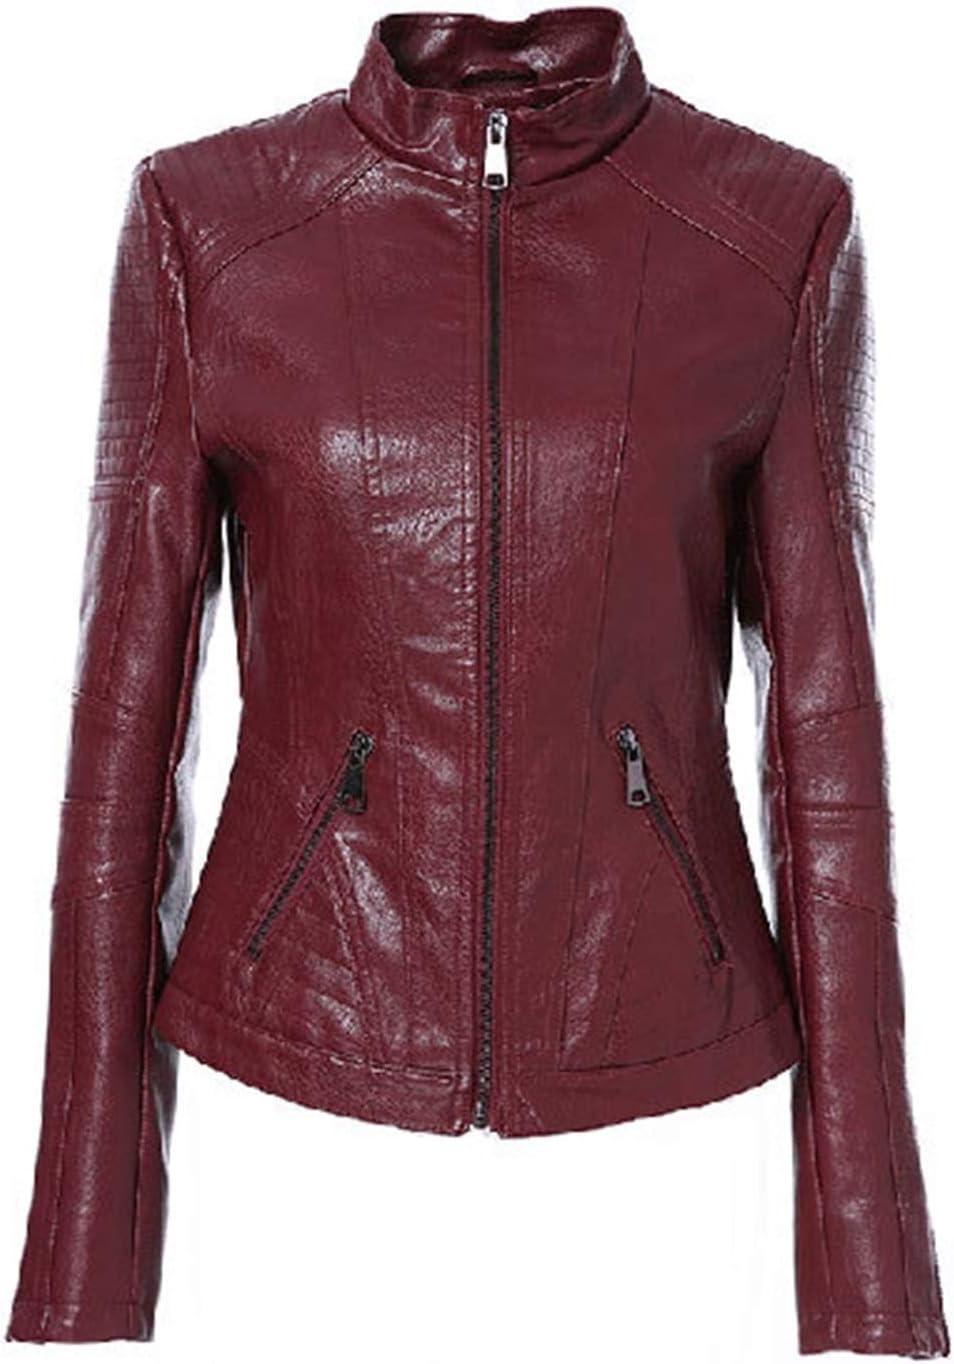 kengbi Jacket Women Leather Jacket Vintage Women's PU Leather Jacket Mandarin Collar Slim Female Black Faux Leather Outwear (Color : Red Wine, Size : M)